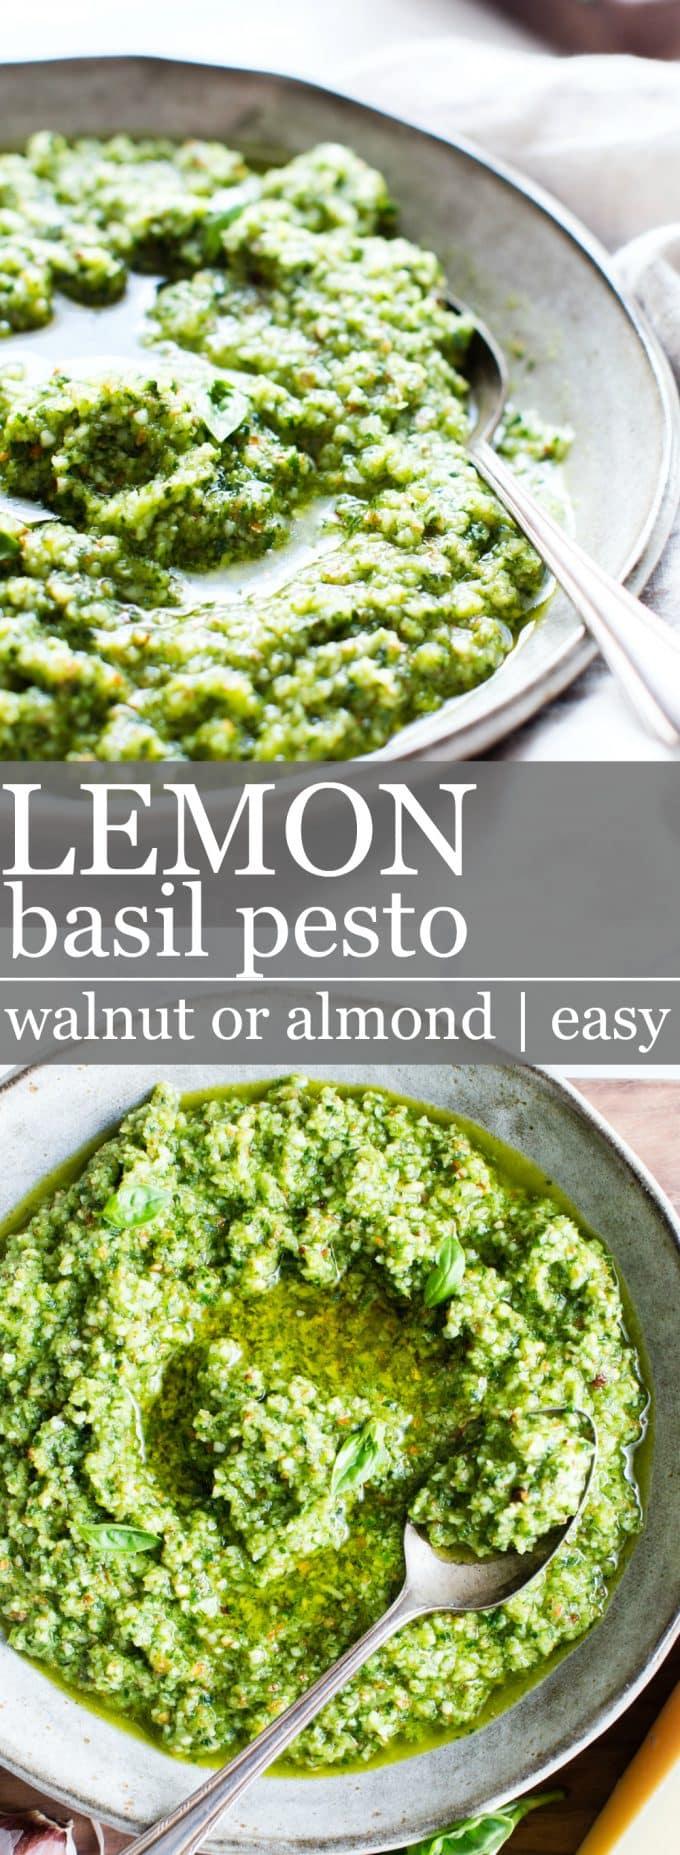 Lemon Basil Pesto Pinterest Pin